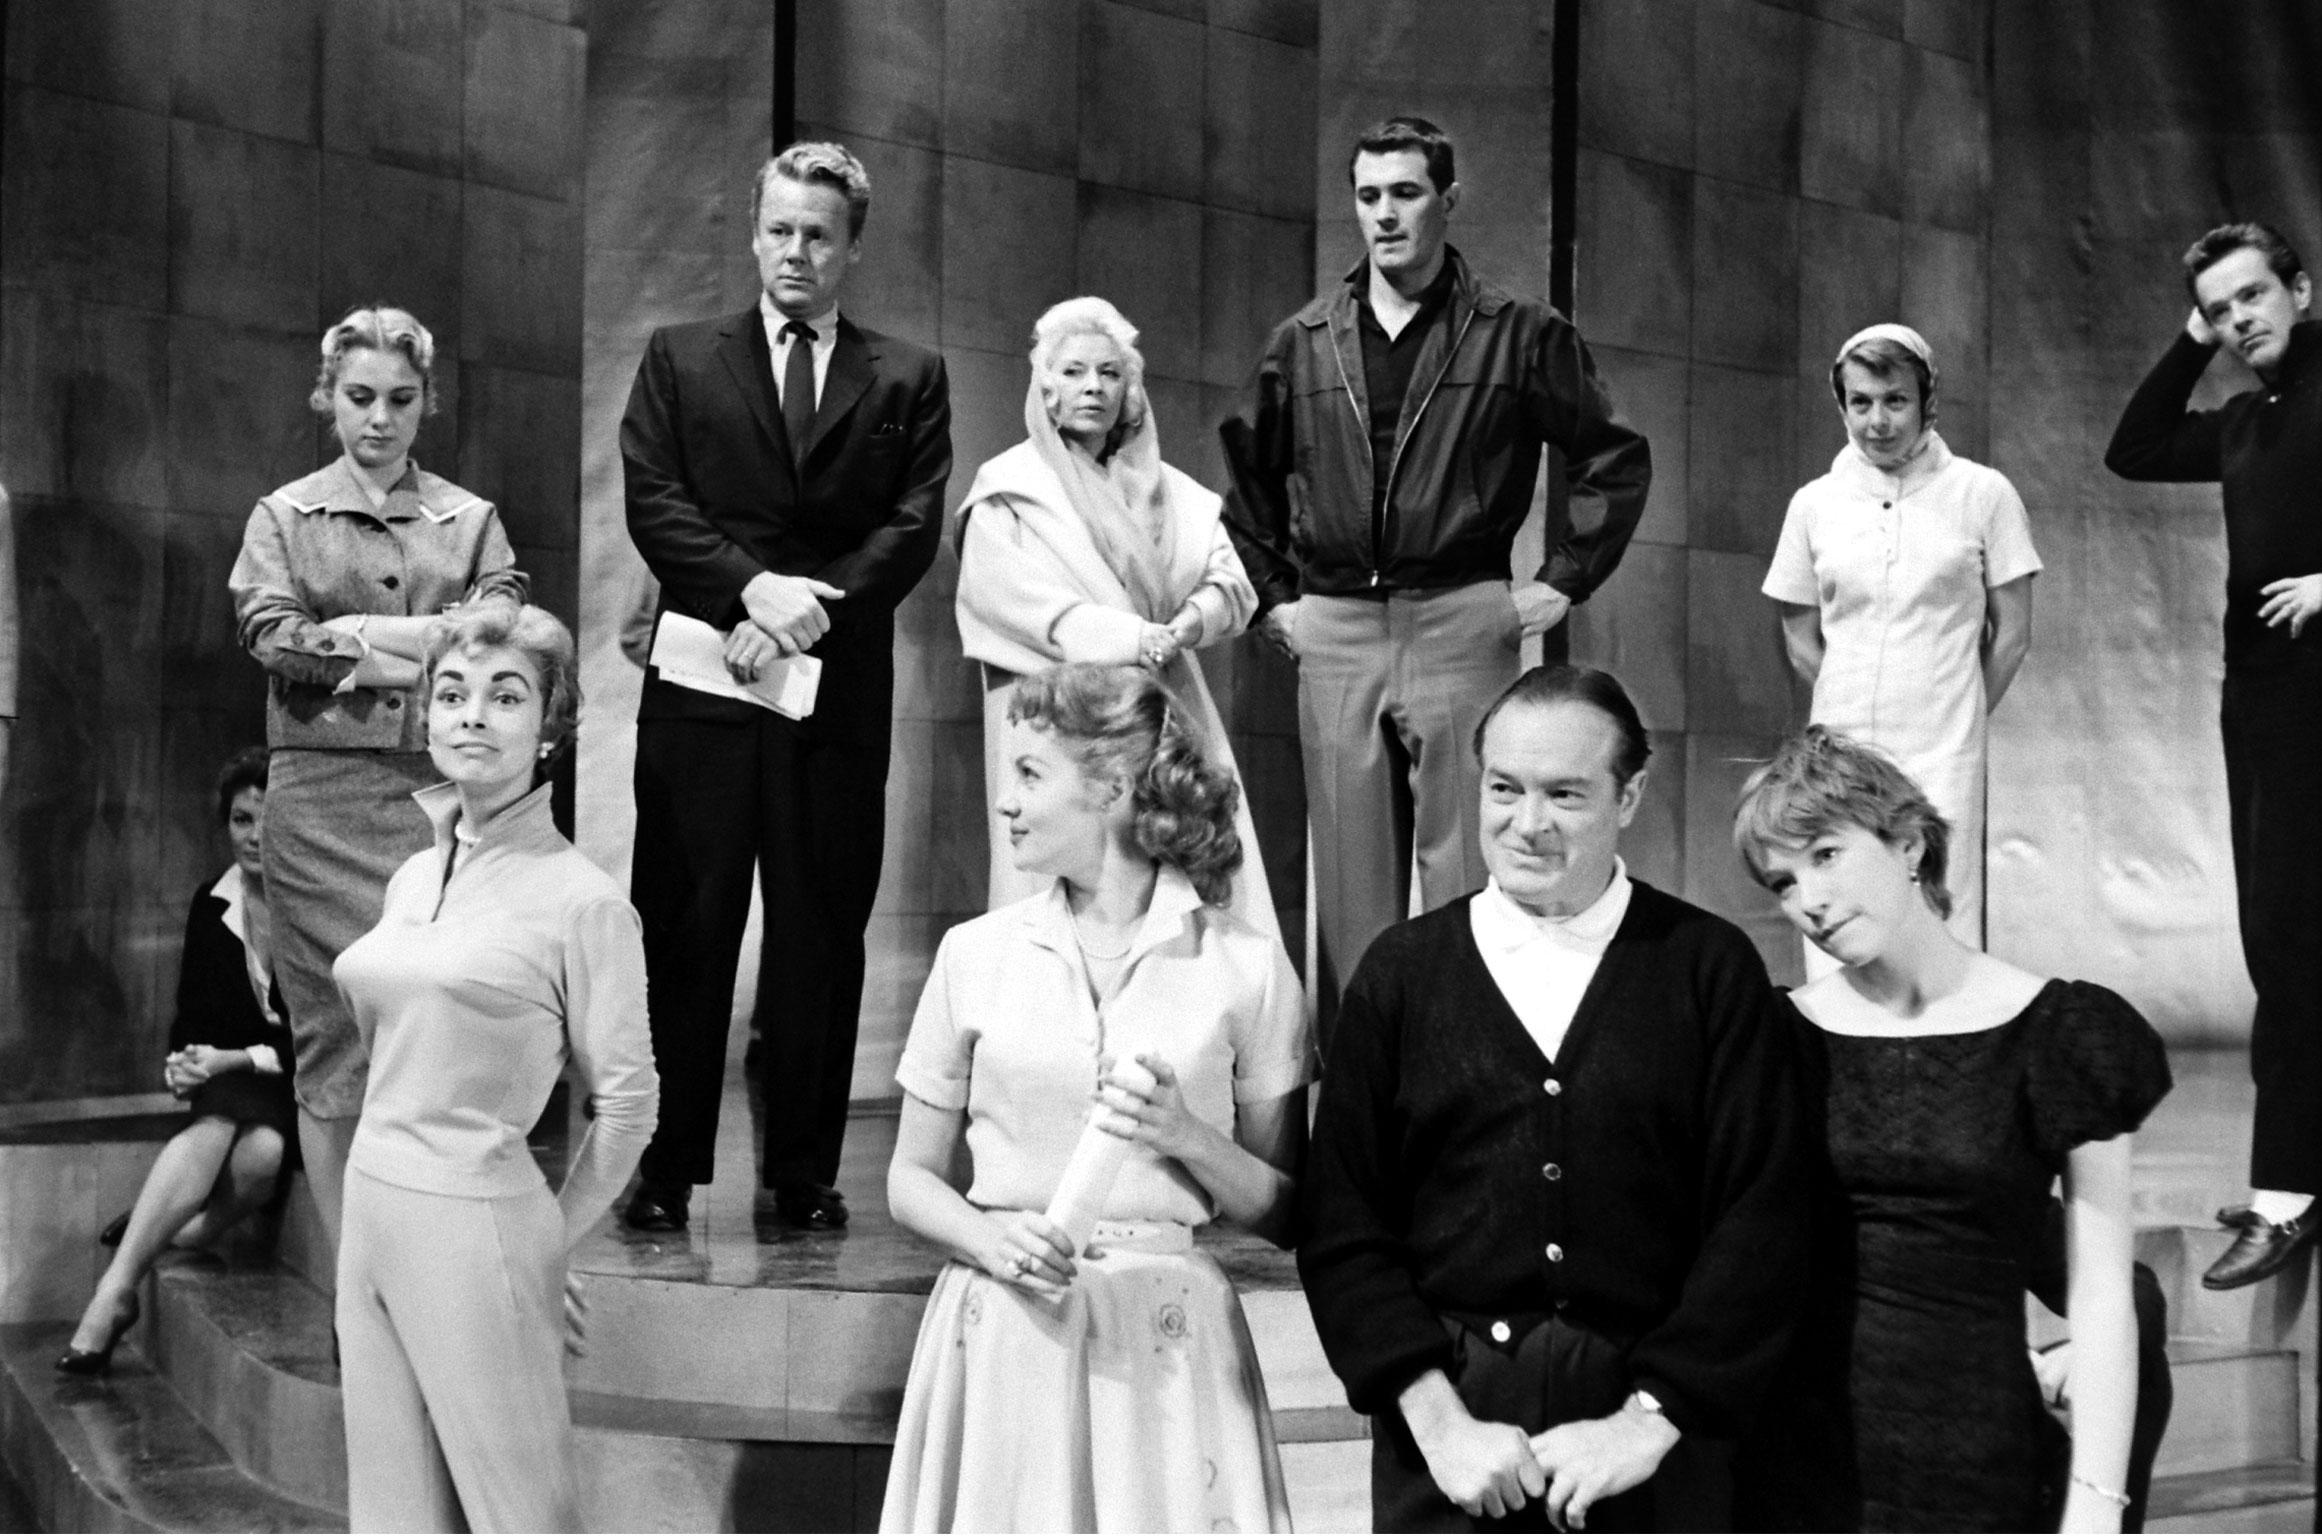 Shirley Jones, Van Johnson, Mae West, Rock Hudson, Marge Gower Champion, Janet Leigh, Rhonda Fleming, Bob Hope, Shirley MacLaine